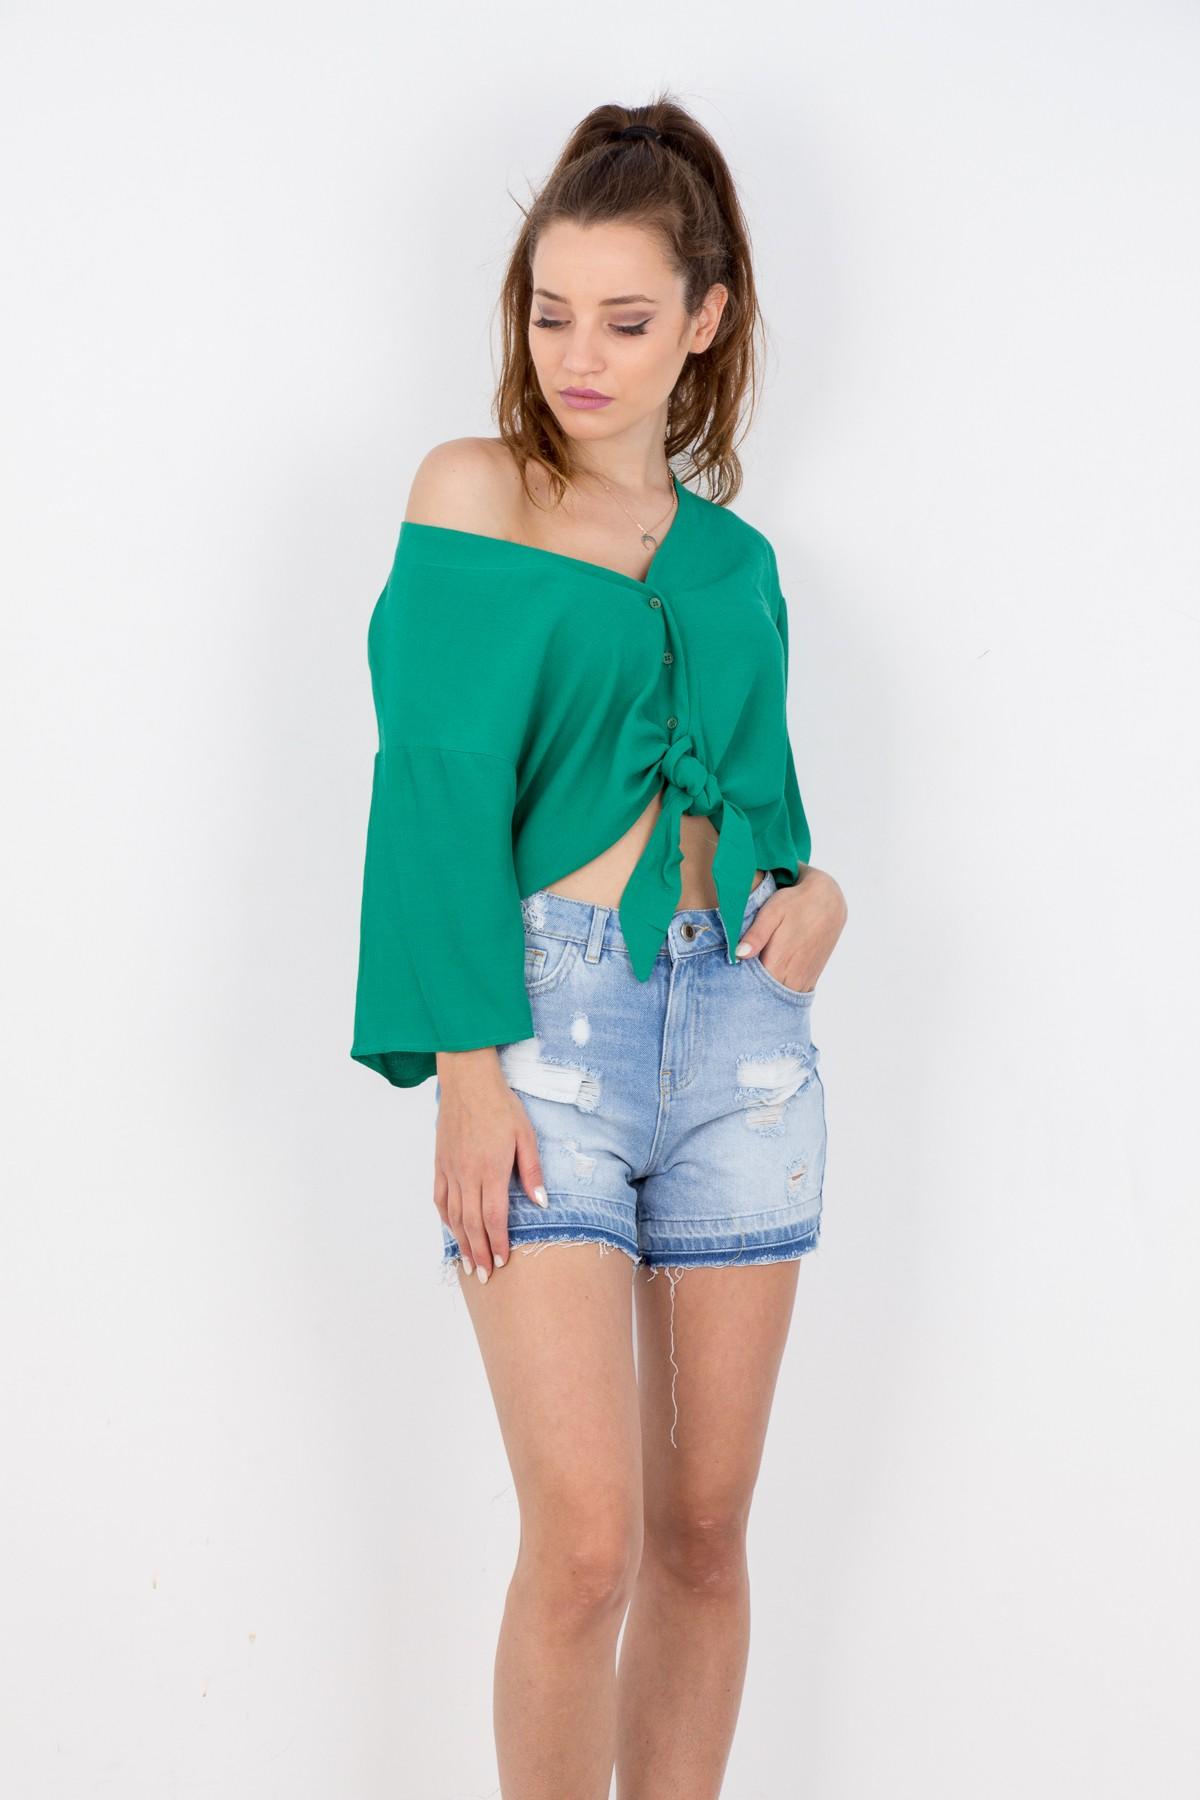 6a4e4dbcad9f BSM Γυναικεία μπλούζα με κουμπιά